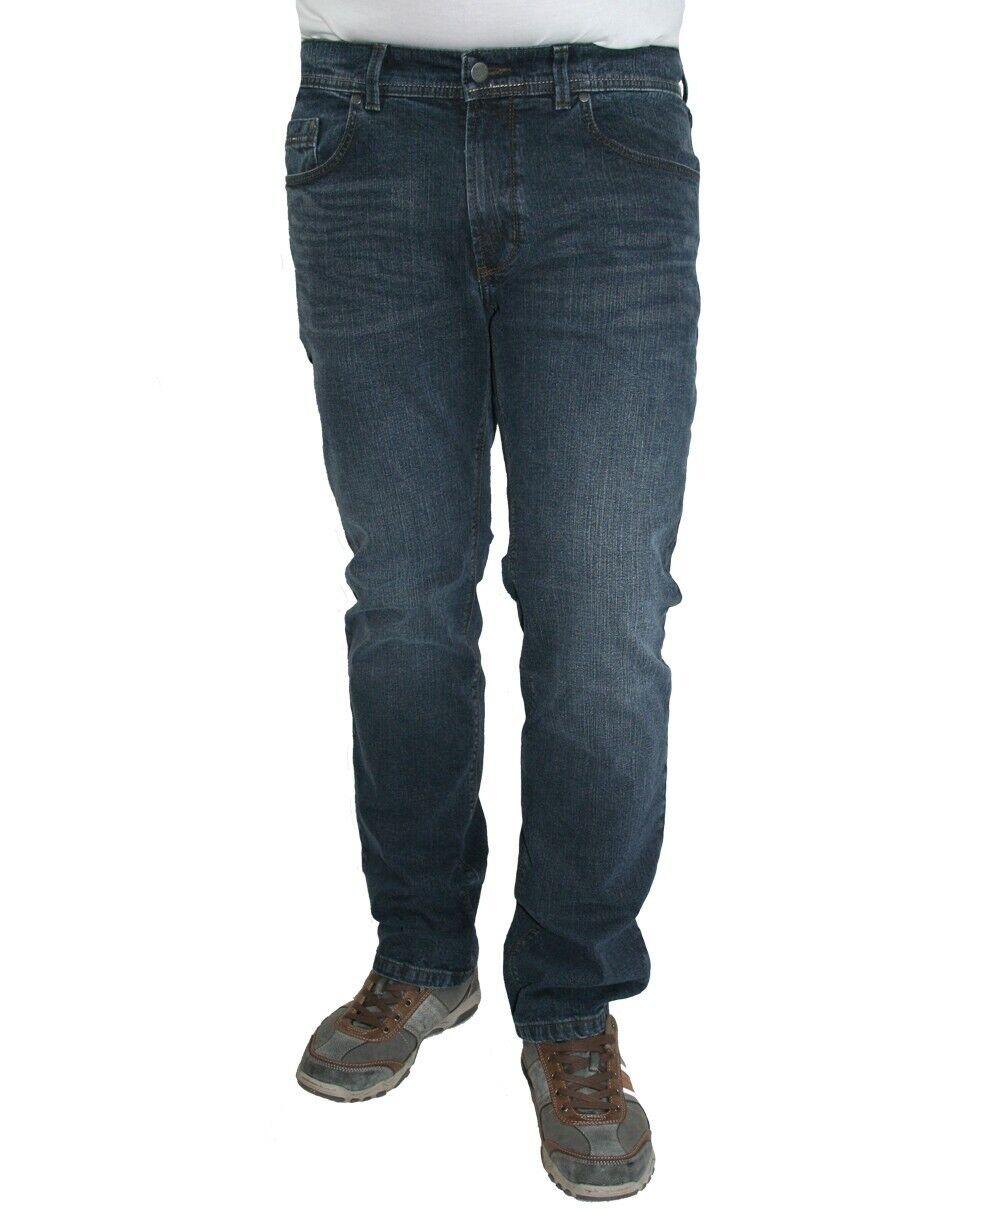 Pioneer Jeans 9774.34.1680 - Rando Stretch dunkelblau     dark used 89f108